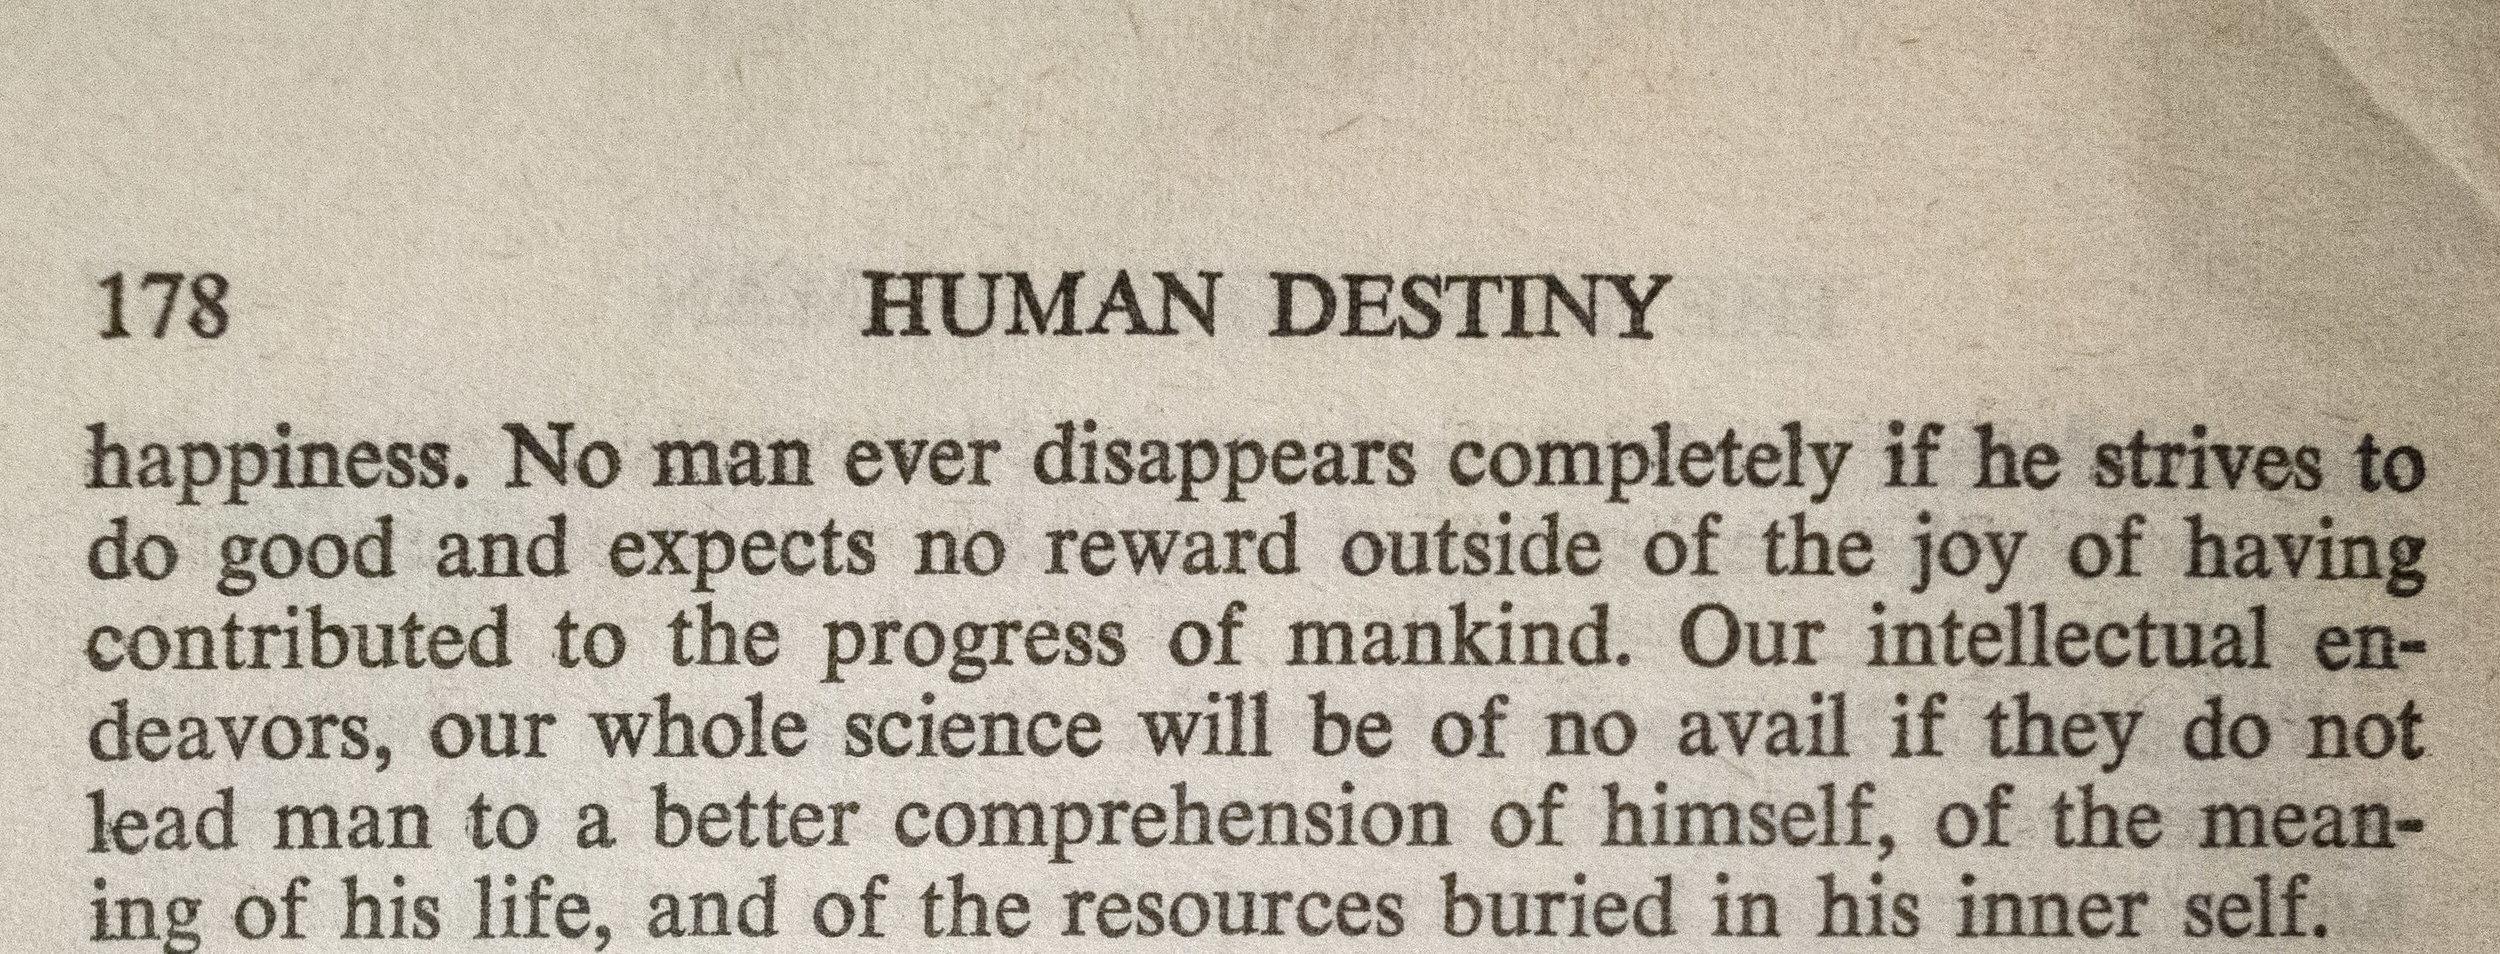 Lecomte du Nouy - Human Destiny